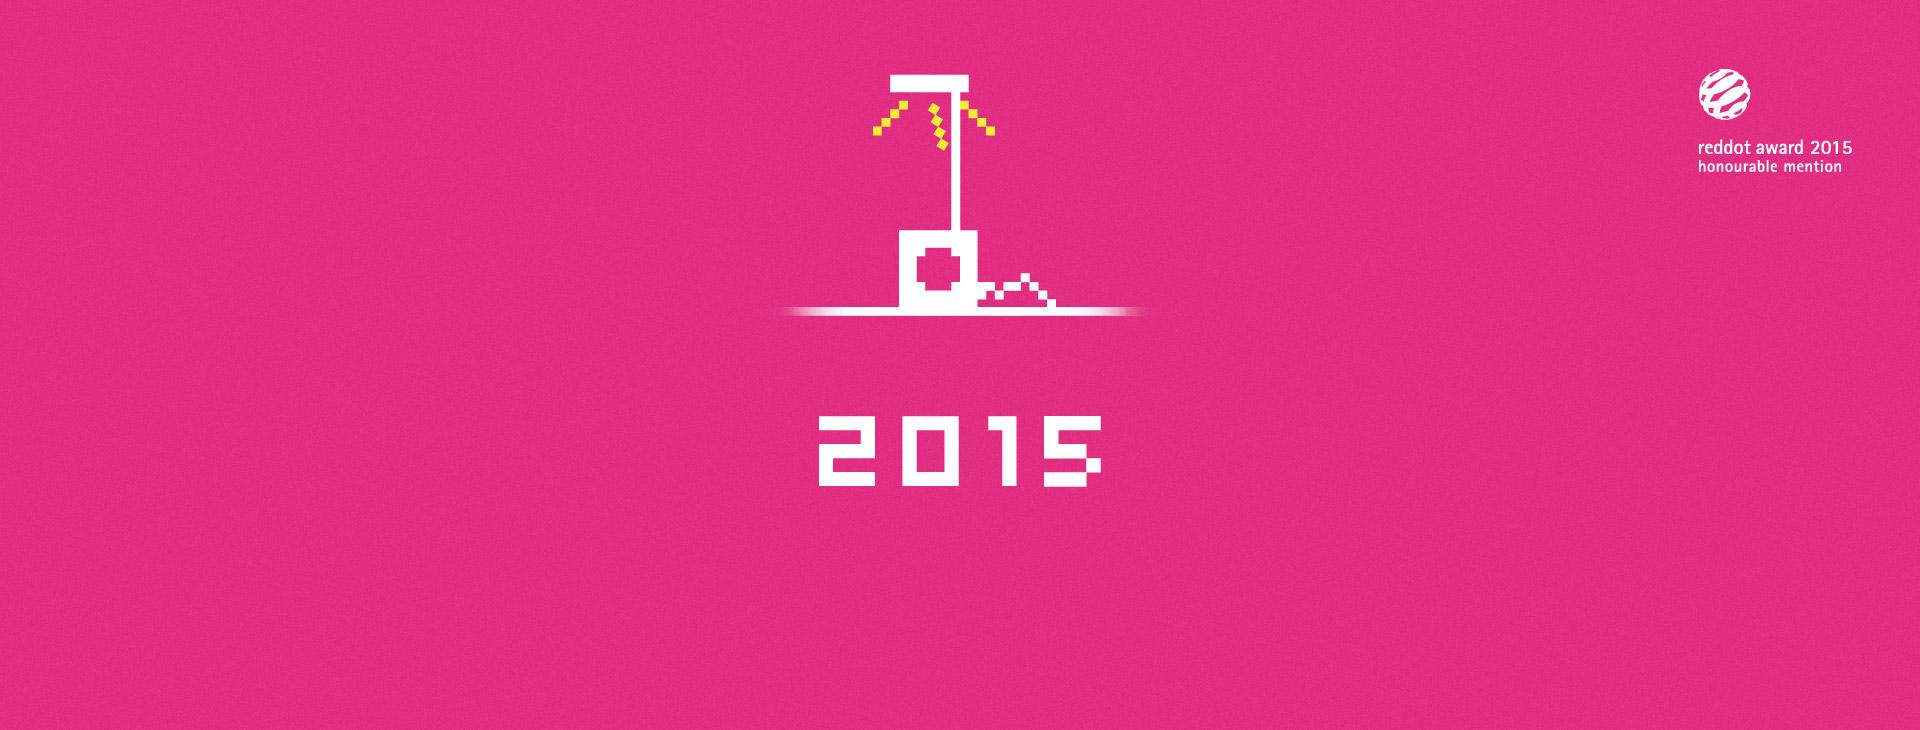 Pixel_Cubert_20151